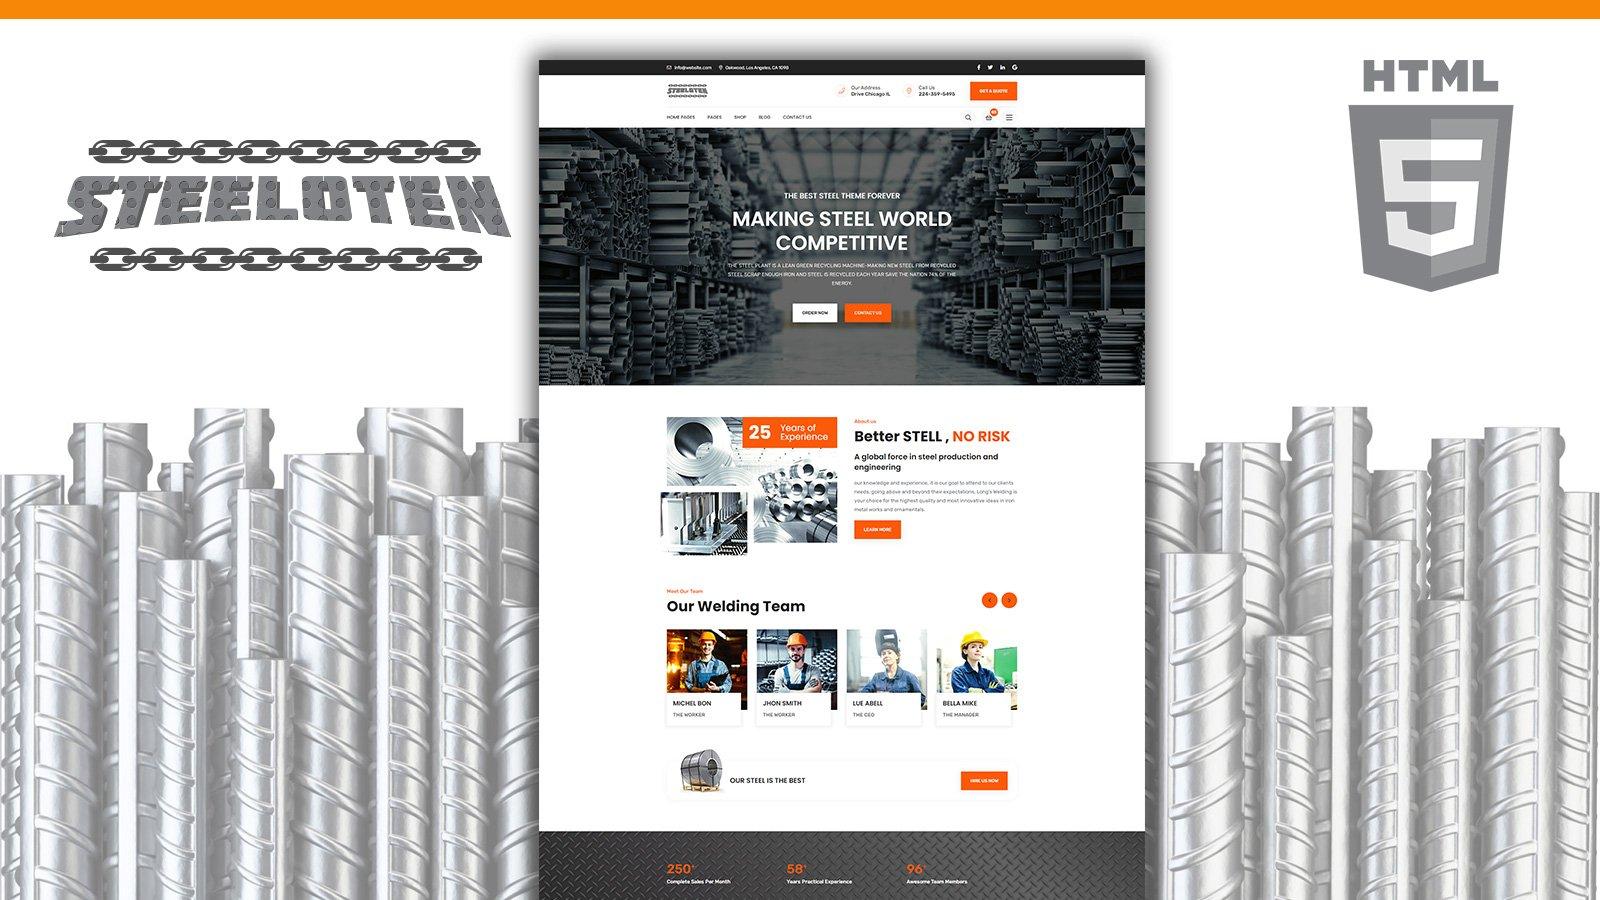 Steeloten Steel Services and Metal Works Shop HTML5 webbplatsmall